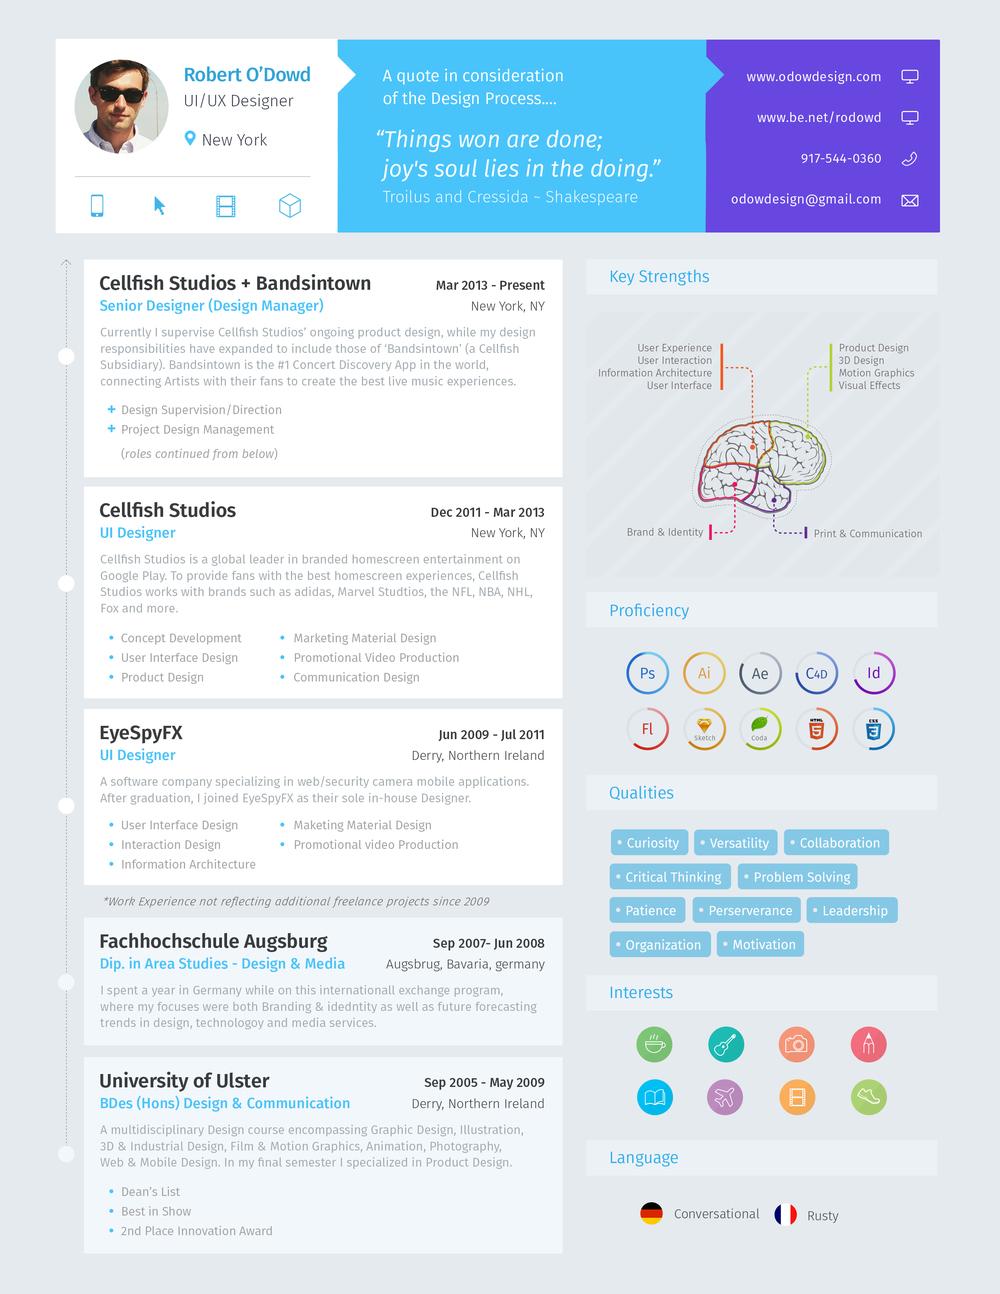 rodowd_resume.jpg